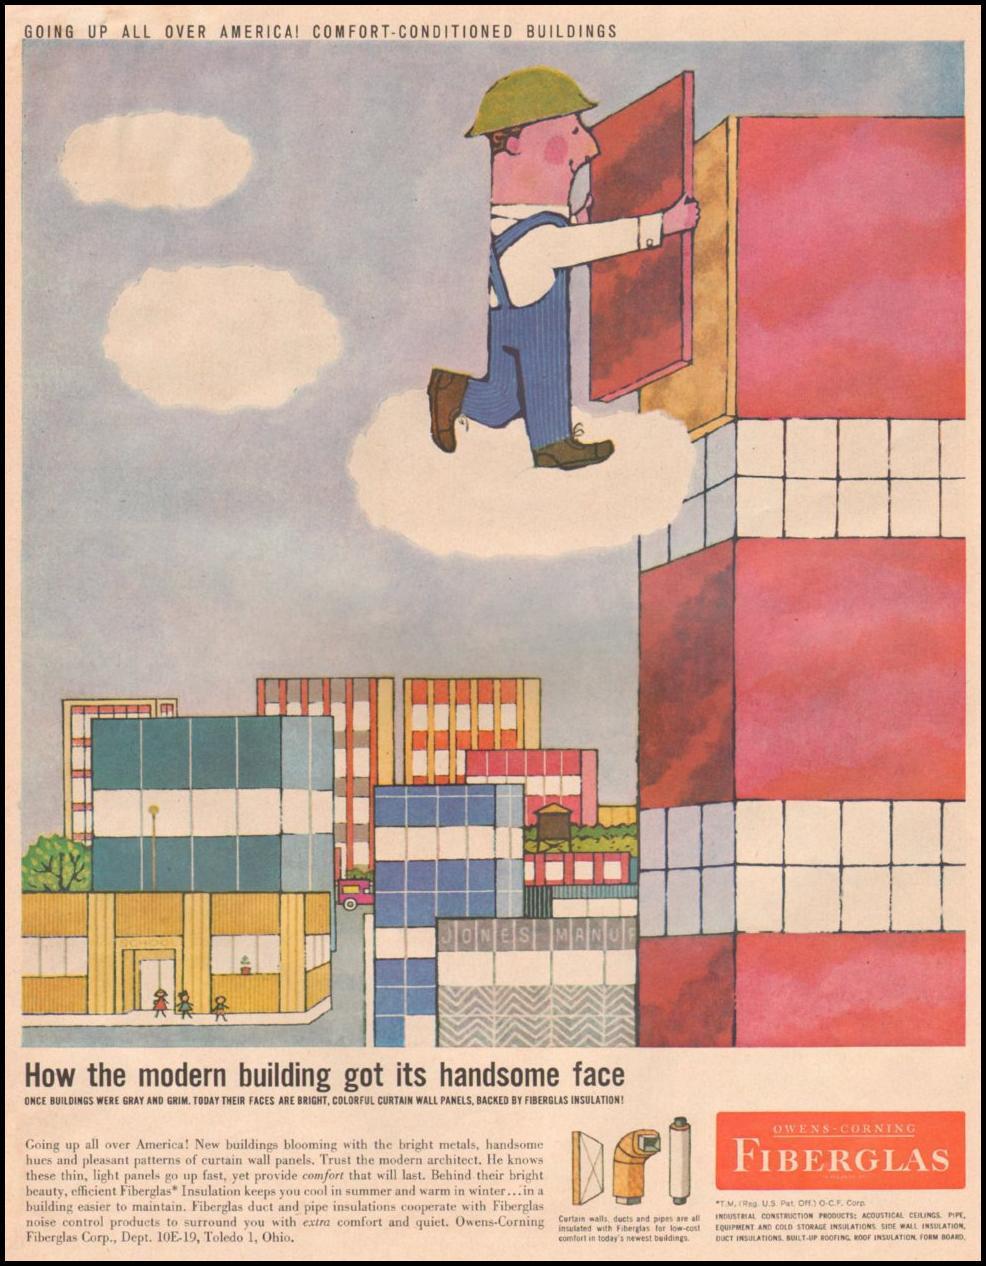 OWENS-CORNING FIBERGLAS LIFE 05/19/1958 p. 5